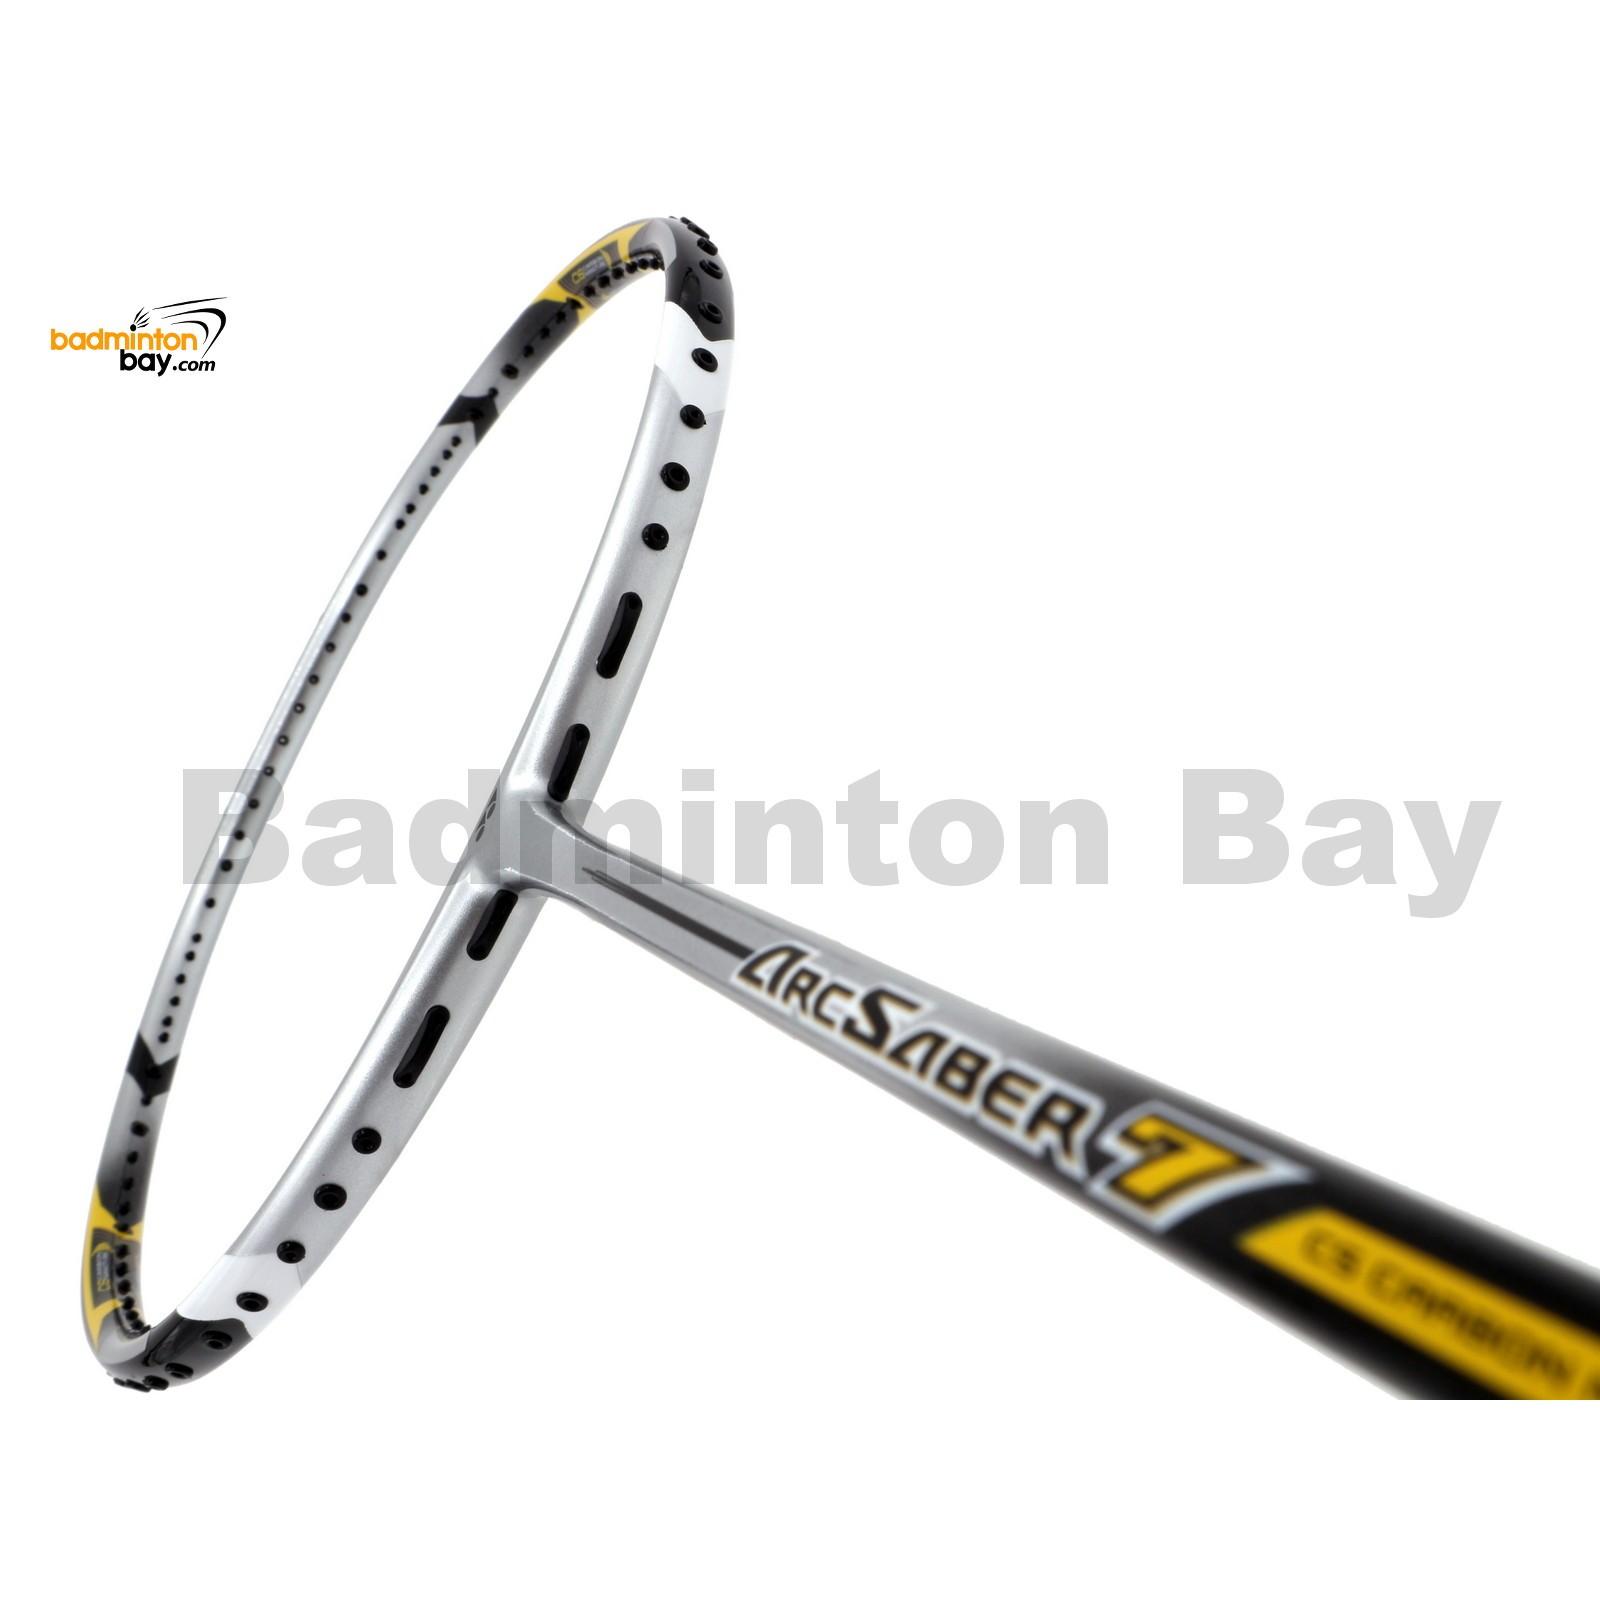 Yonex Arcsaber 7 Silver Yellow Badminton Racket Arc7 3u G5